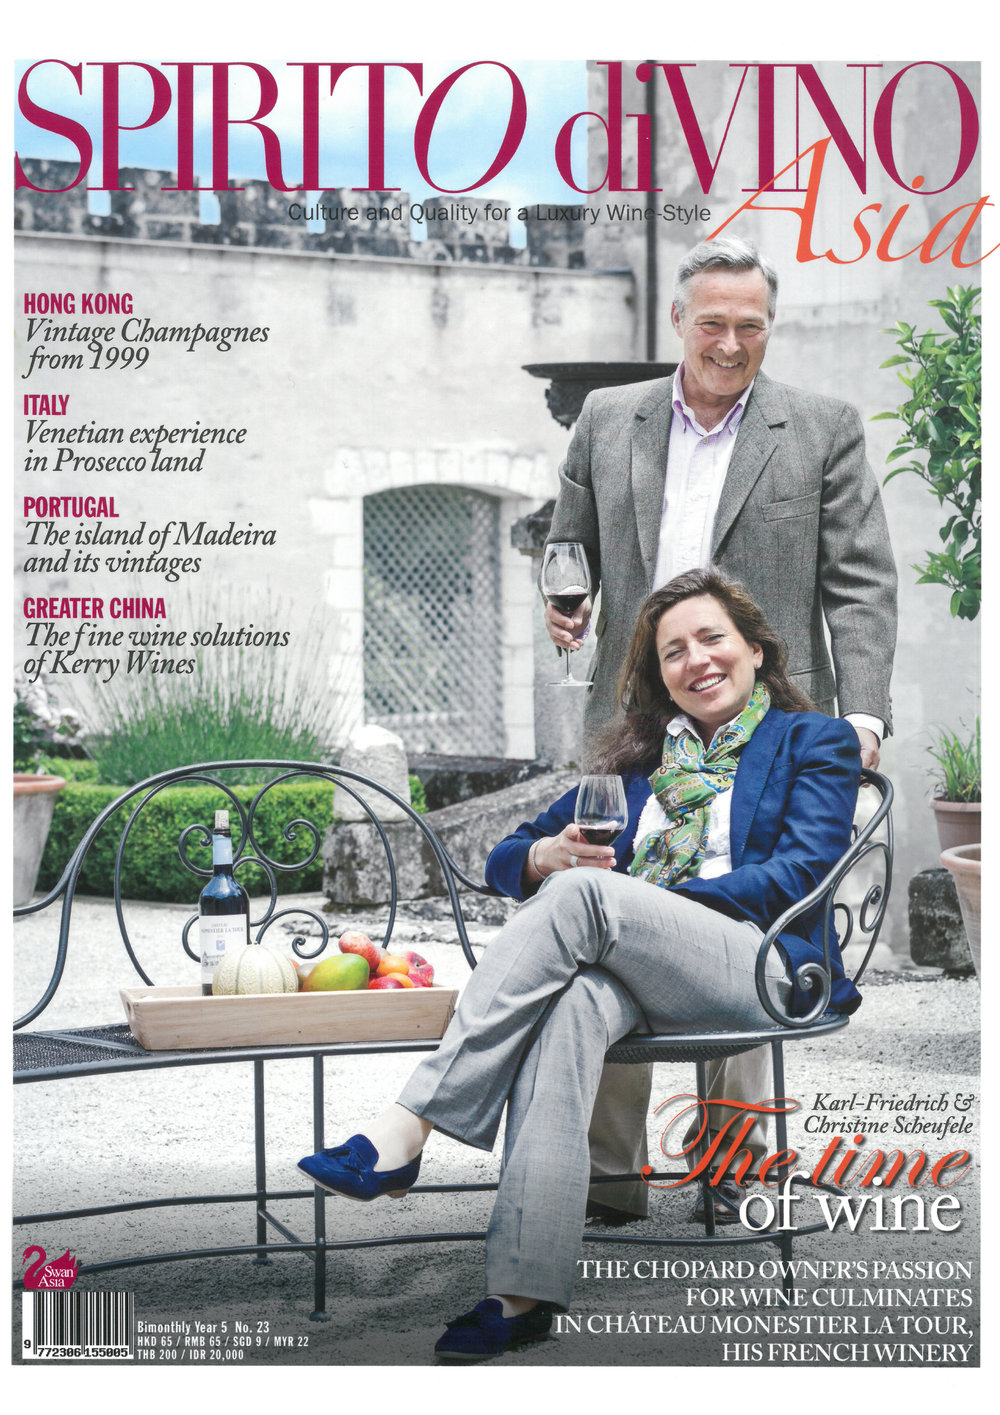 Spiritodivino(AugSep2016)Cover.jpg